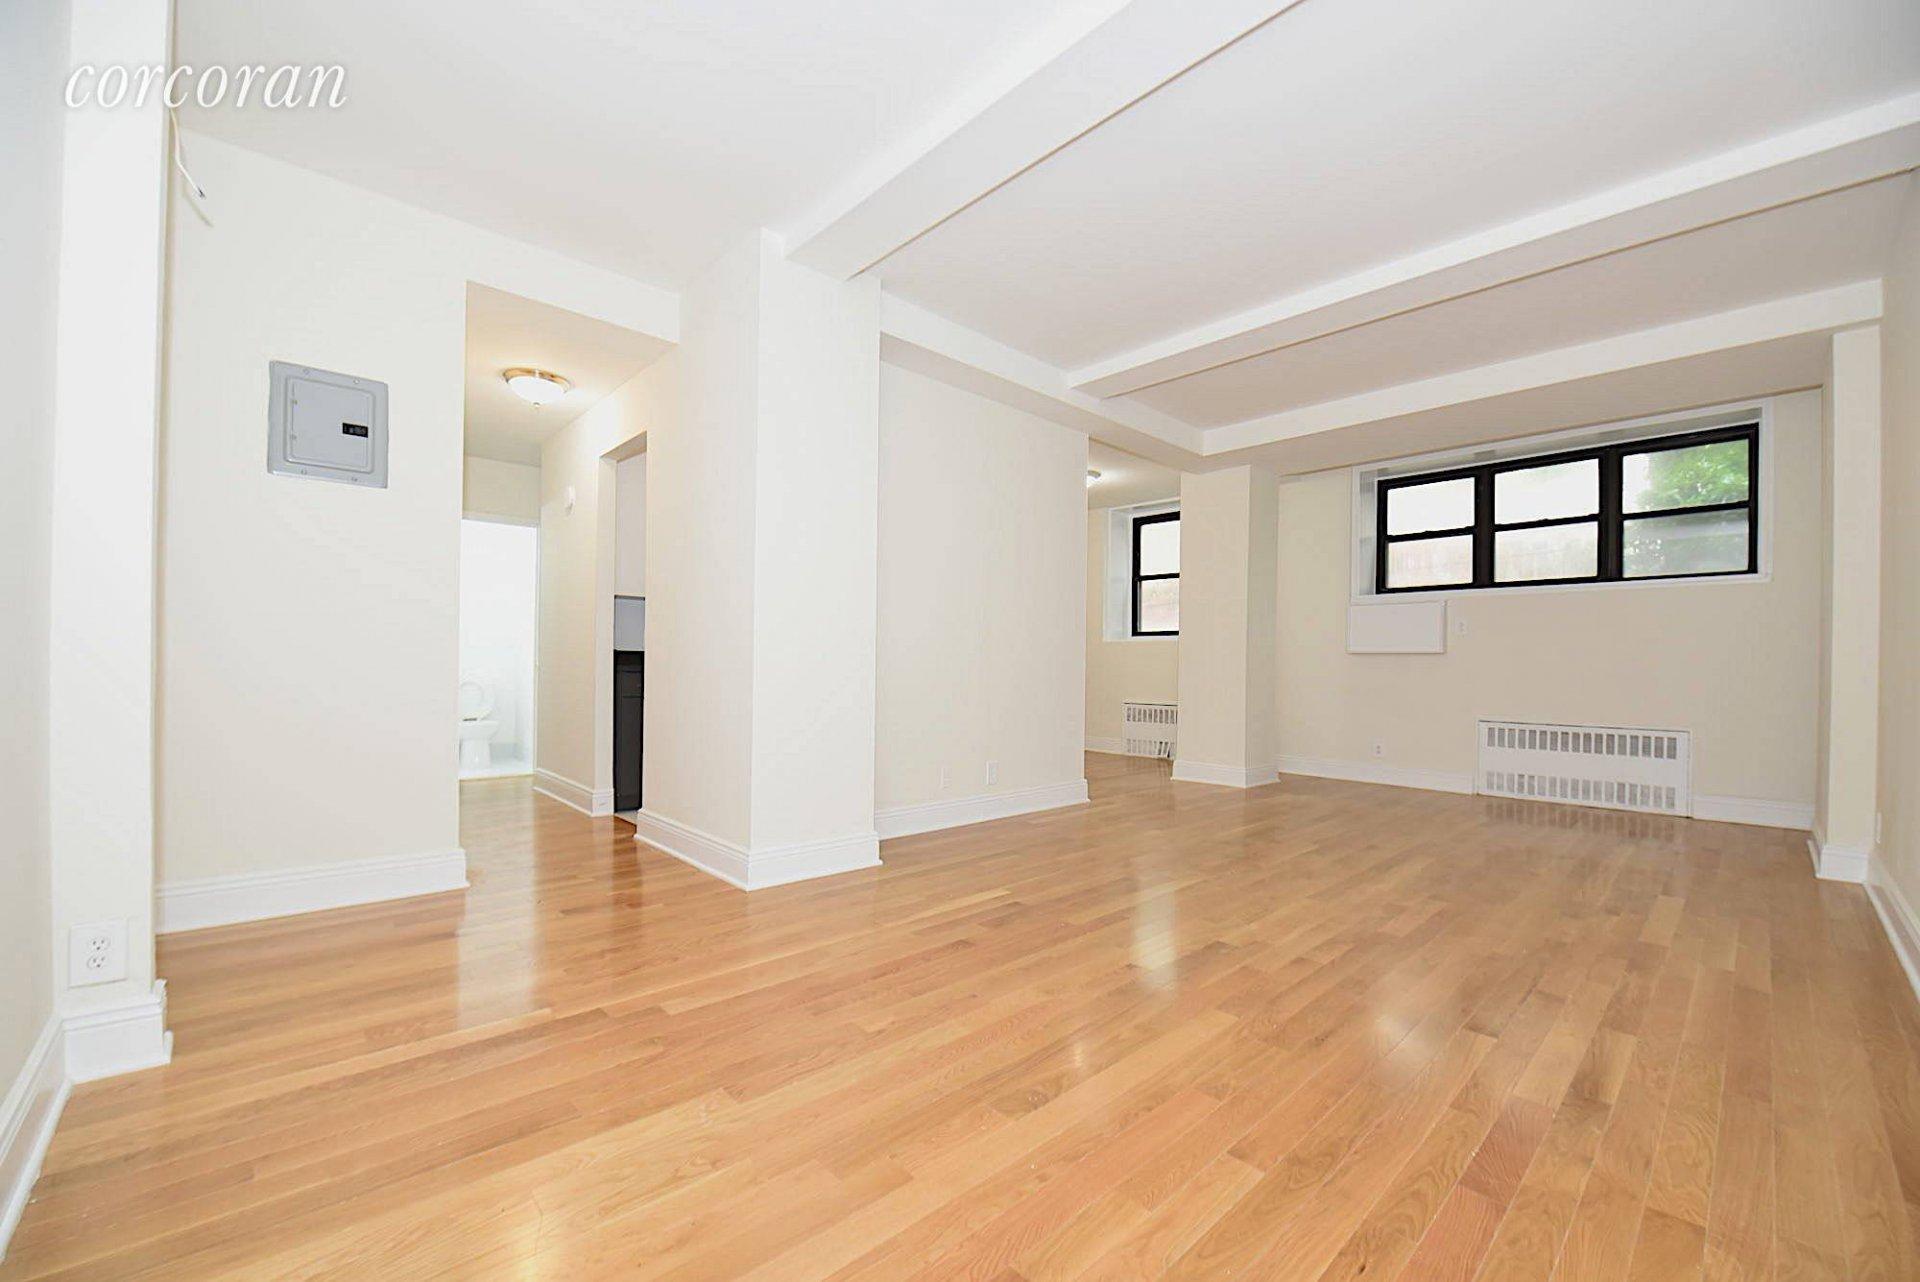 Phenomenal Ad Rental Apartment Bronx 10463 Ref 5782089 Interior Design Ideas Grebswwsoteloinfo